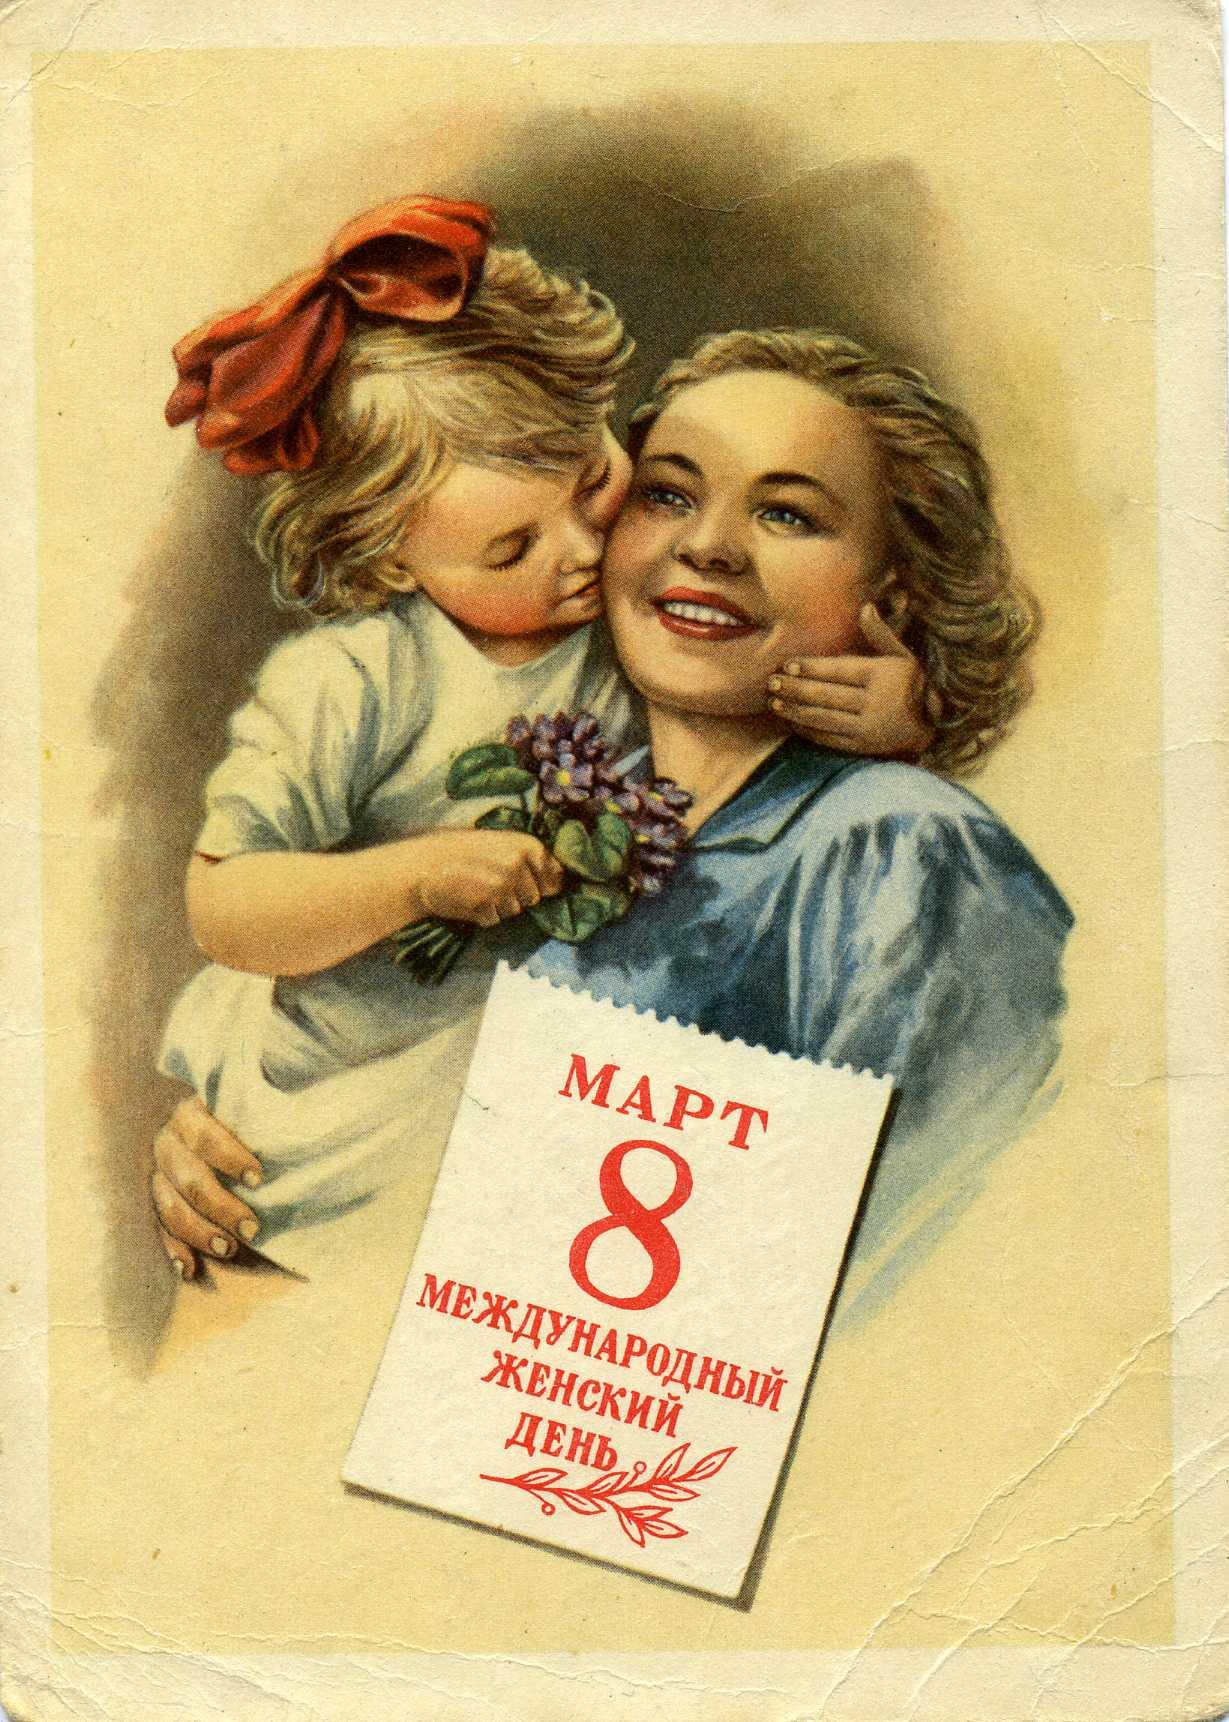 Мега коллекция советских открыток к 8 ...: nevsepic.com.ua/otkrytki/page,2,18388-mega-kollekciya-sovetskih...